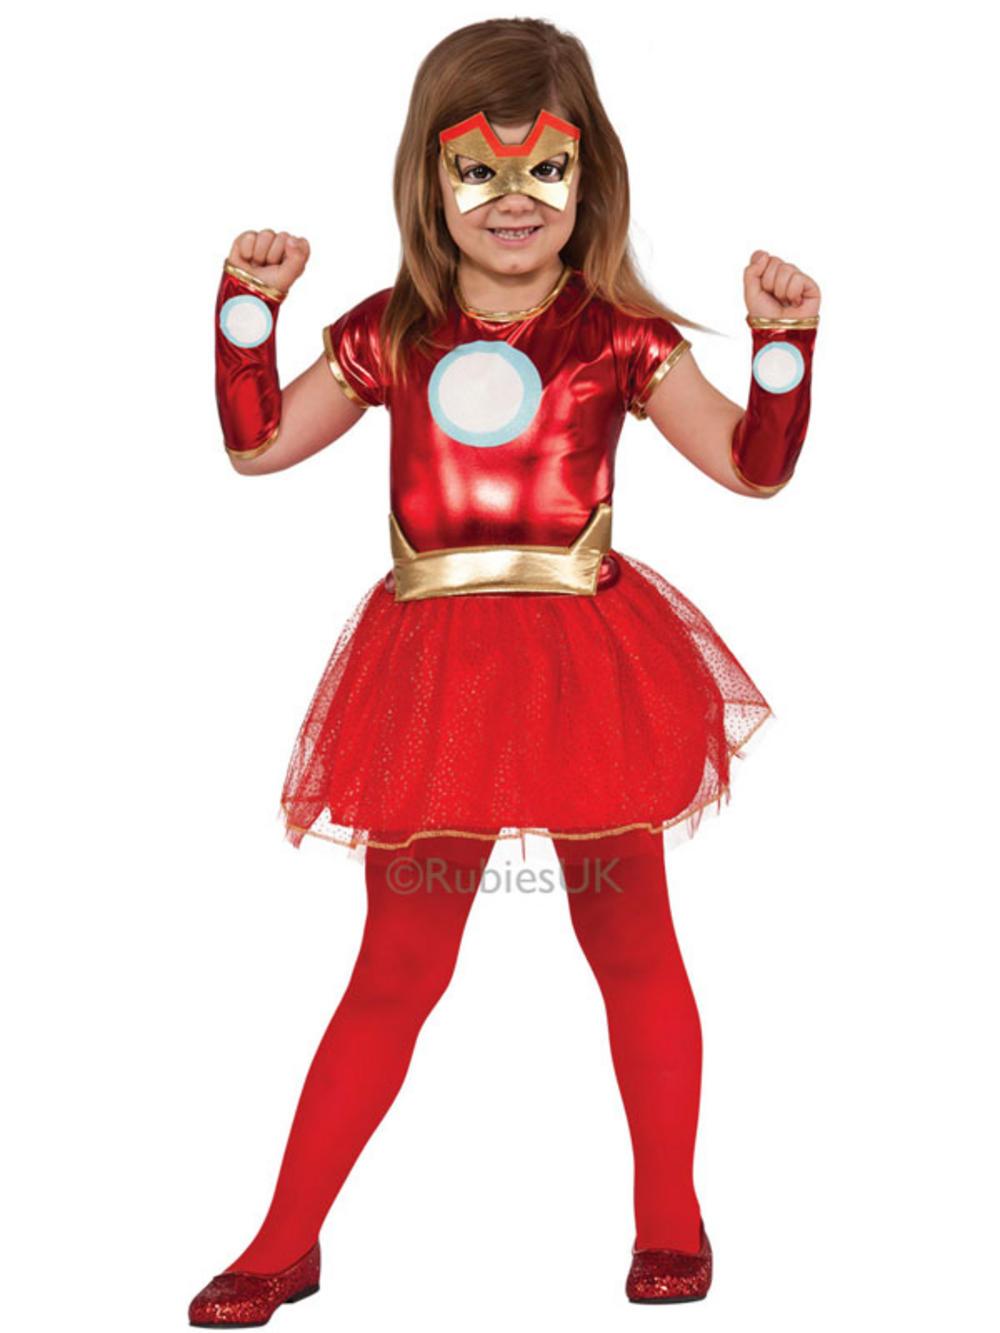 iron man costume girls kids pepper potts superhero rescue tu tu fancy dress